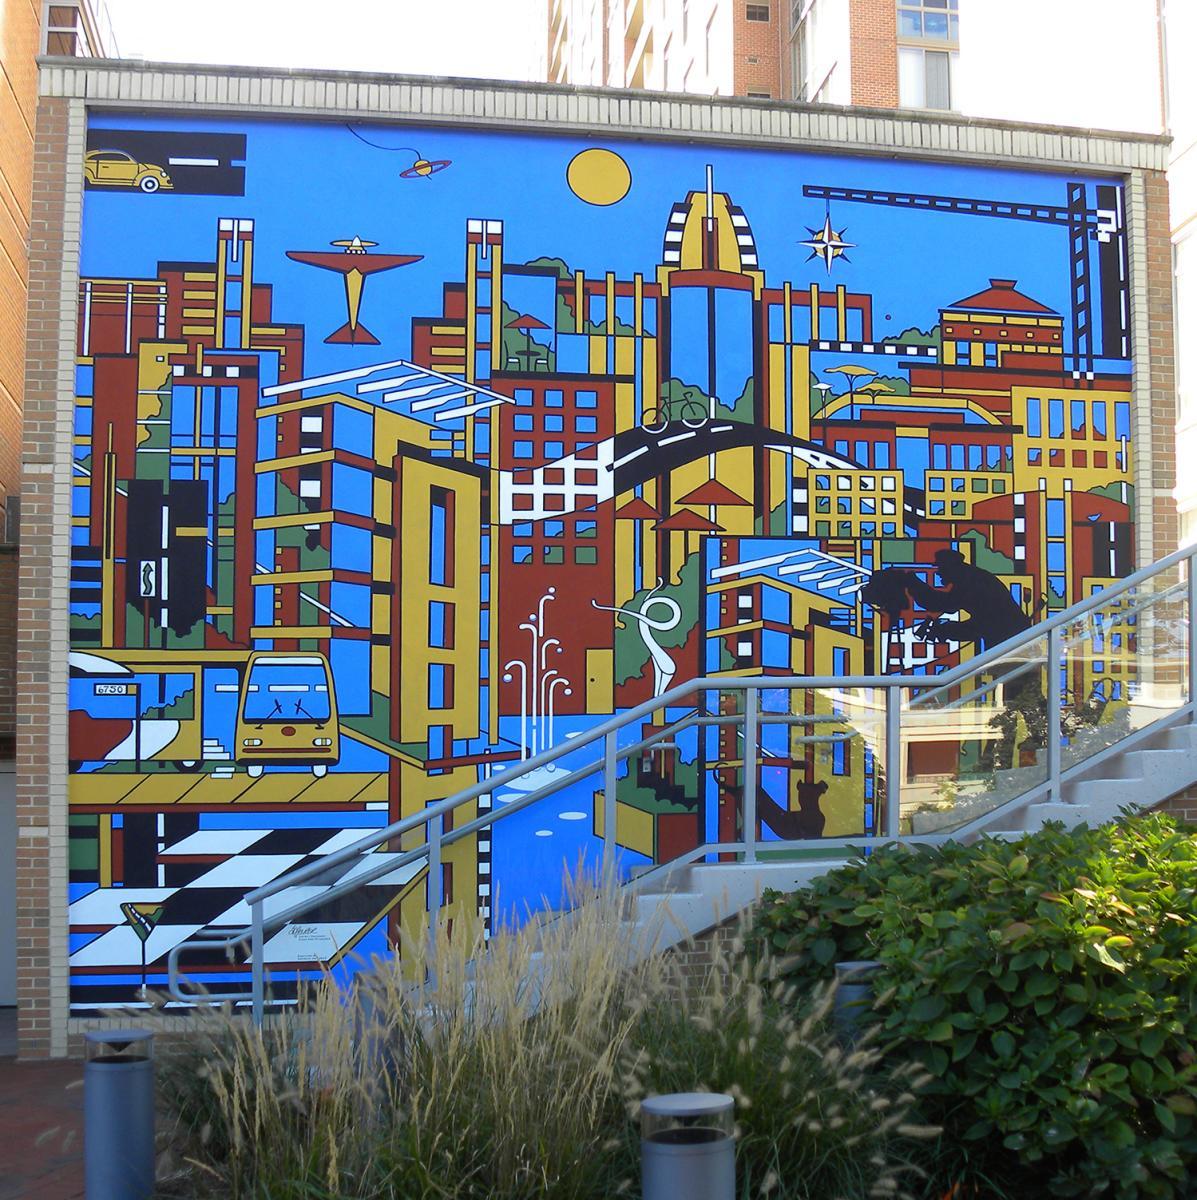 Reston public art - Midtown Community Mural